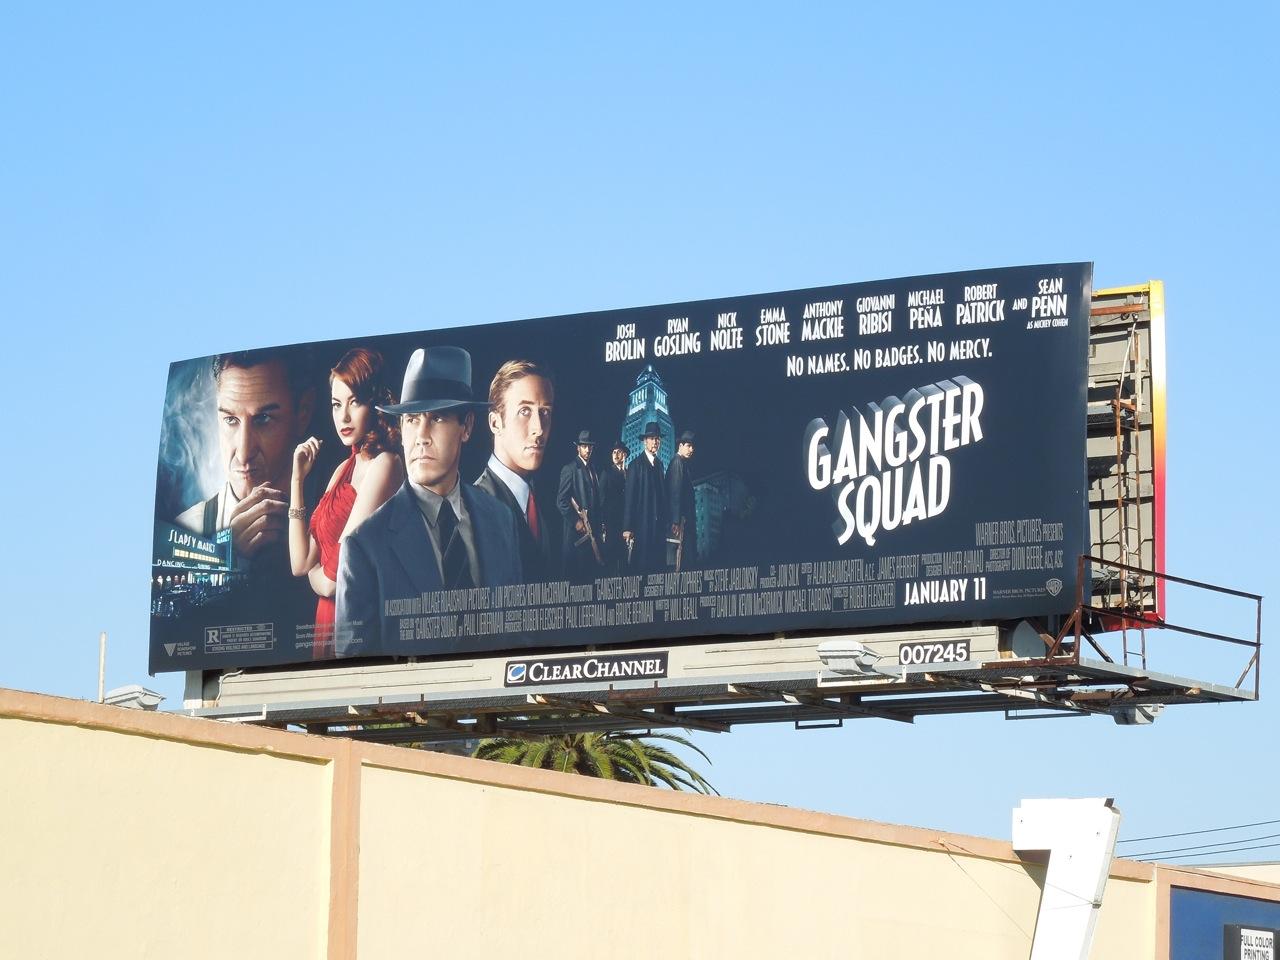 http://3.bp.blogspot.com/-caiPqjUZNWk/UNdJ7OZfg0I/AAAAAAAA728/qgmo-dE6qmk/s1600/Gangster+Squad+billboard.jpg